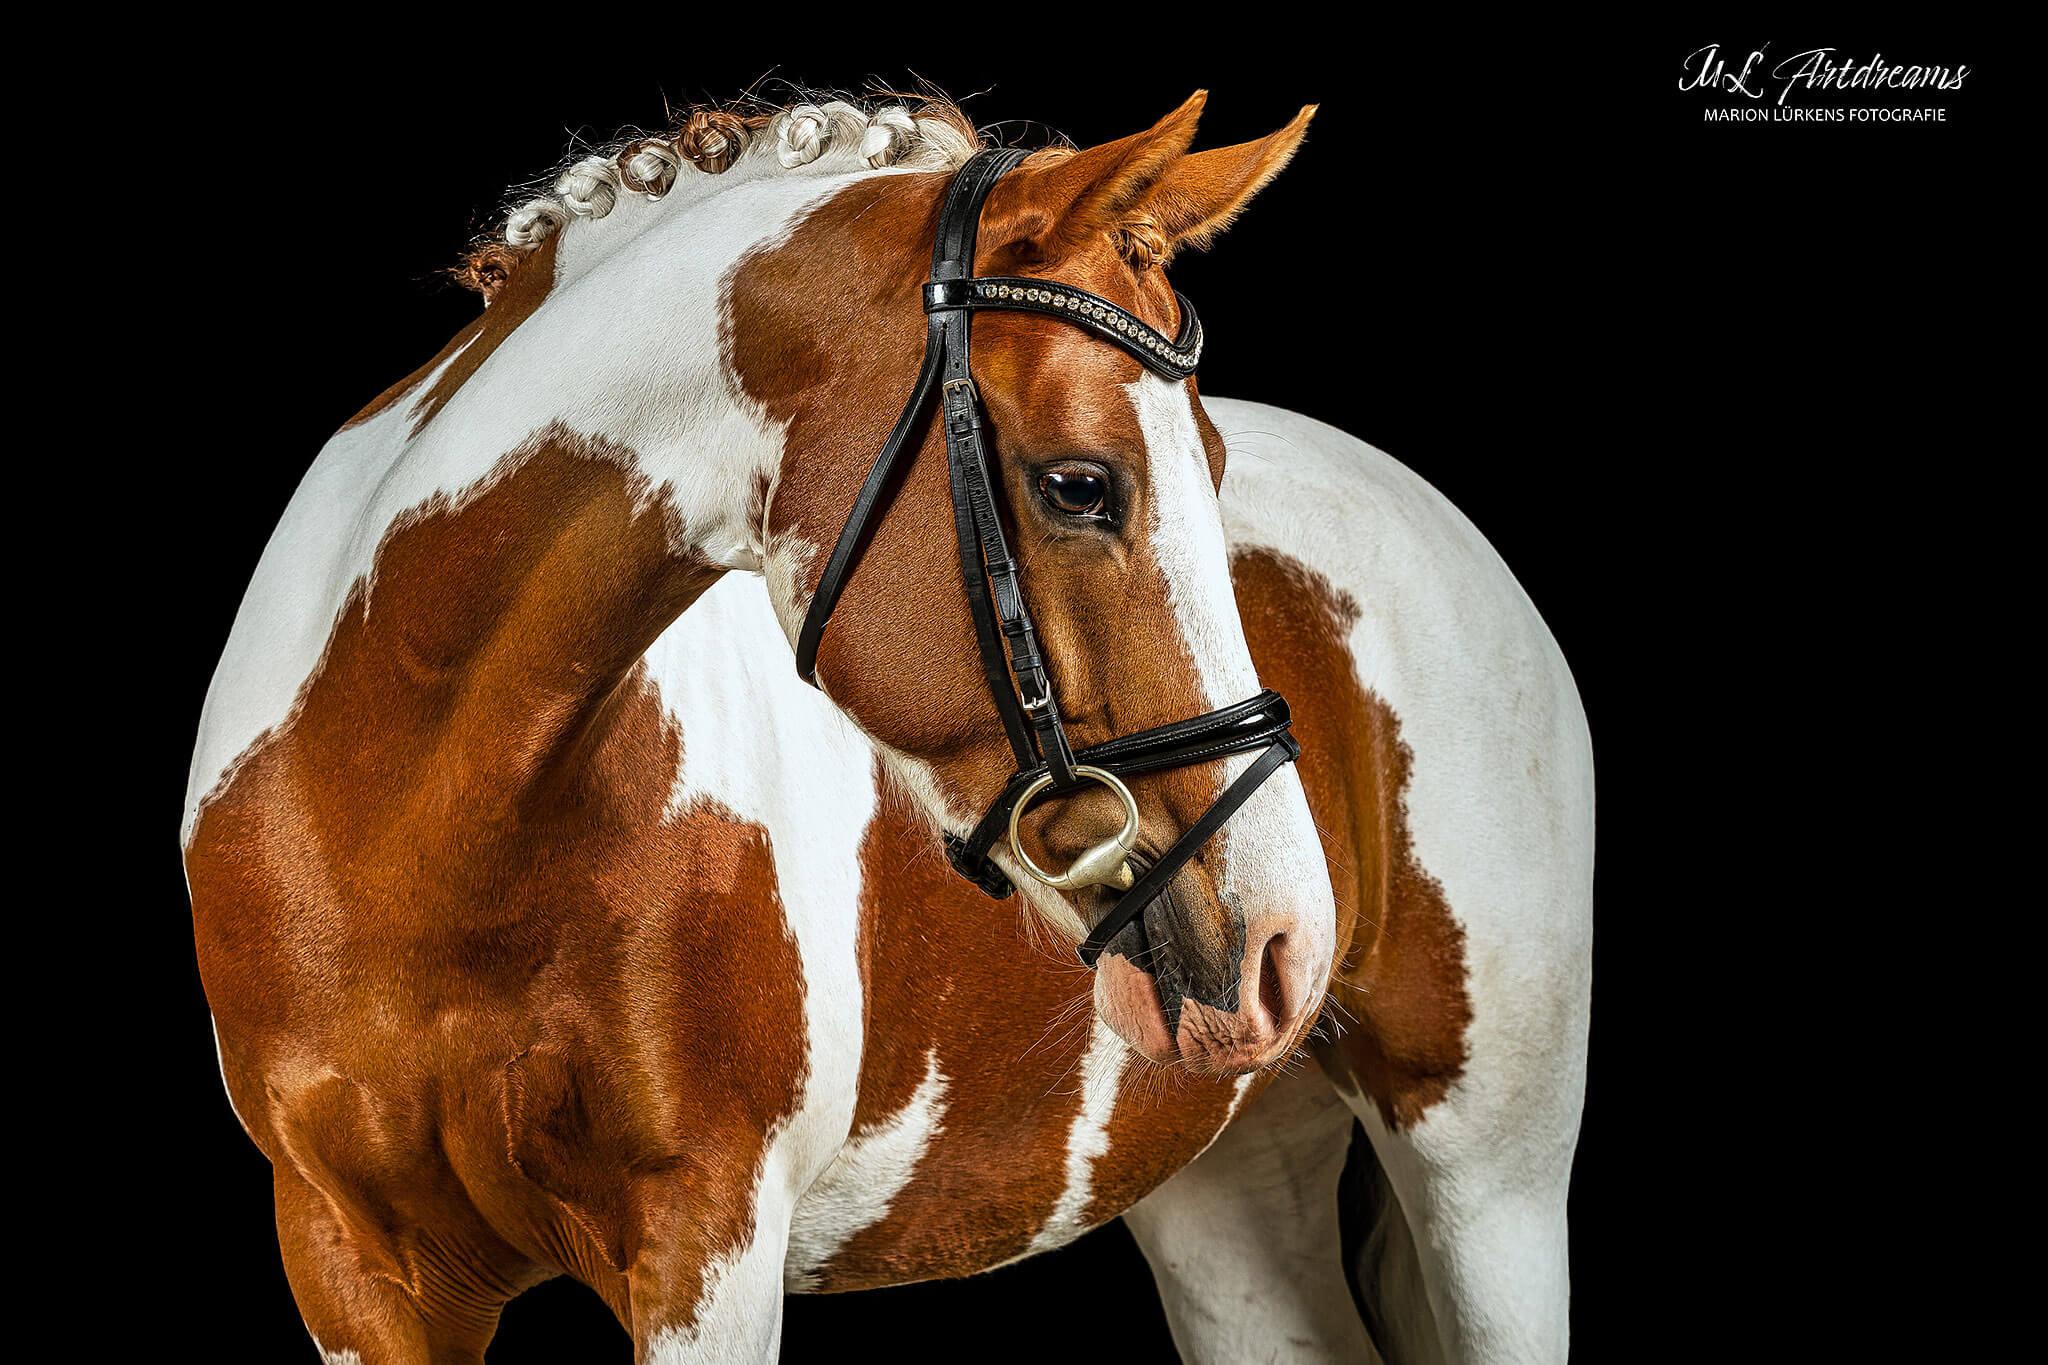 Pony-Scheckpony-schwarzer-Hintergrund